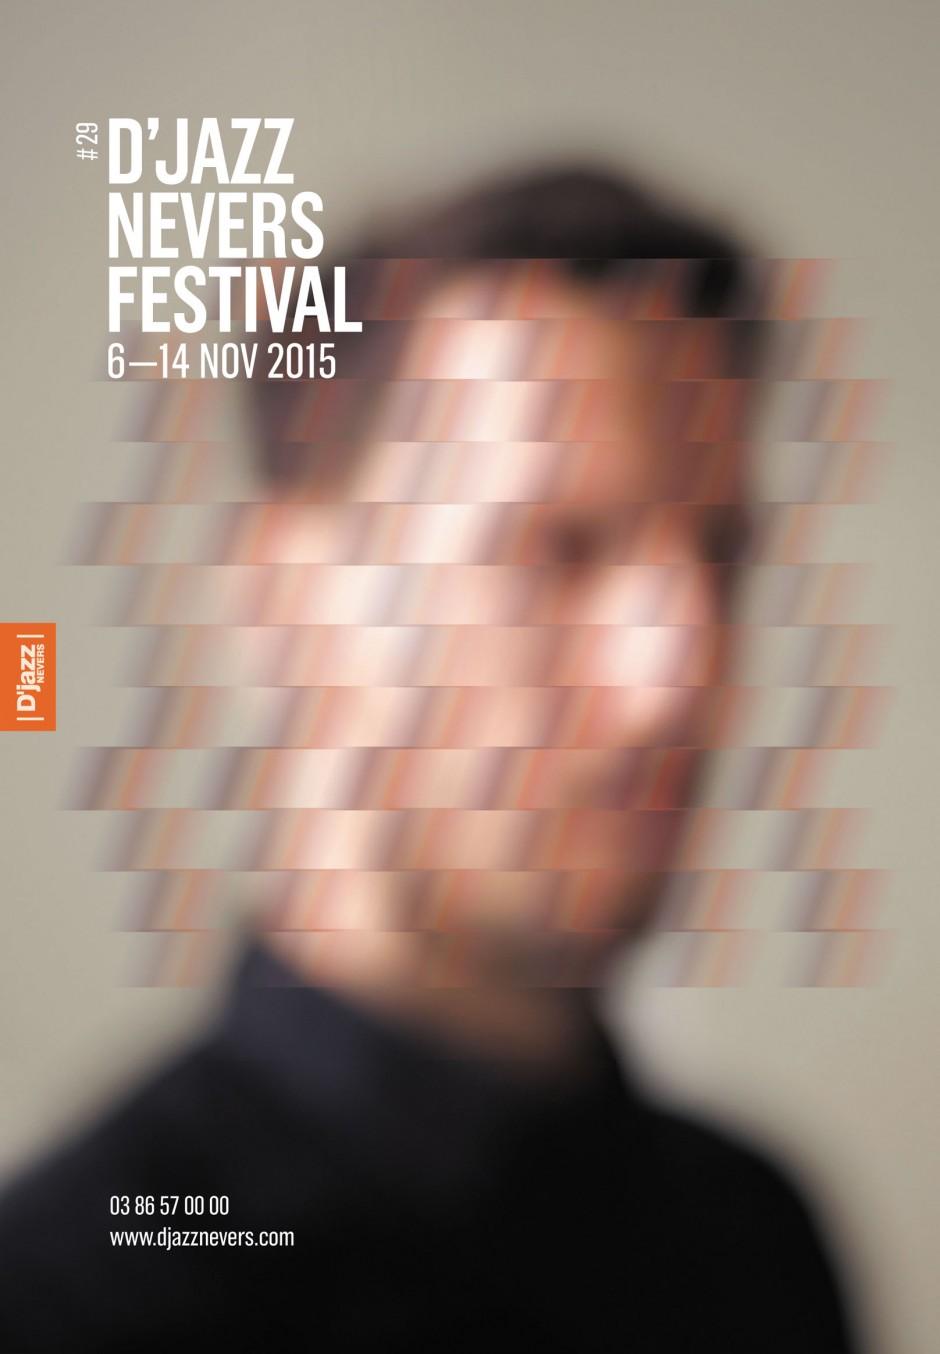 visuel-DJazz-Nevers-Festival-2015_HD